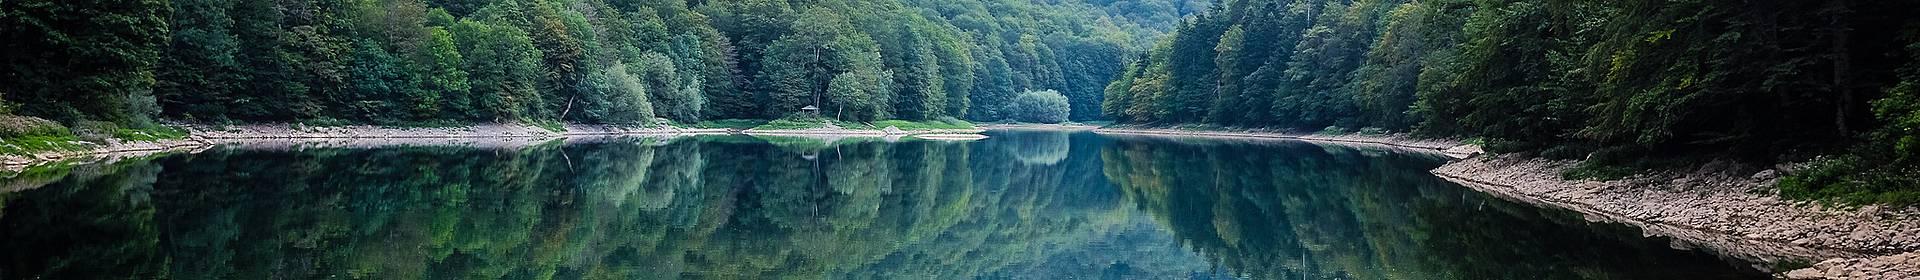 Parc national biogradska Gora